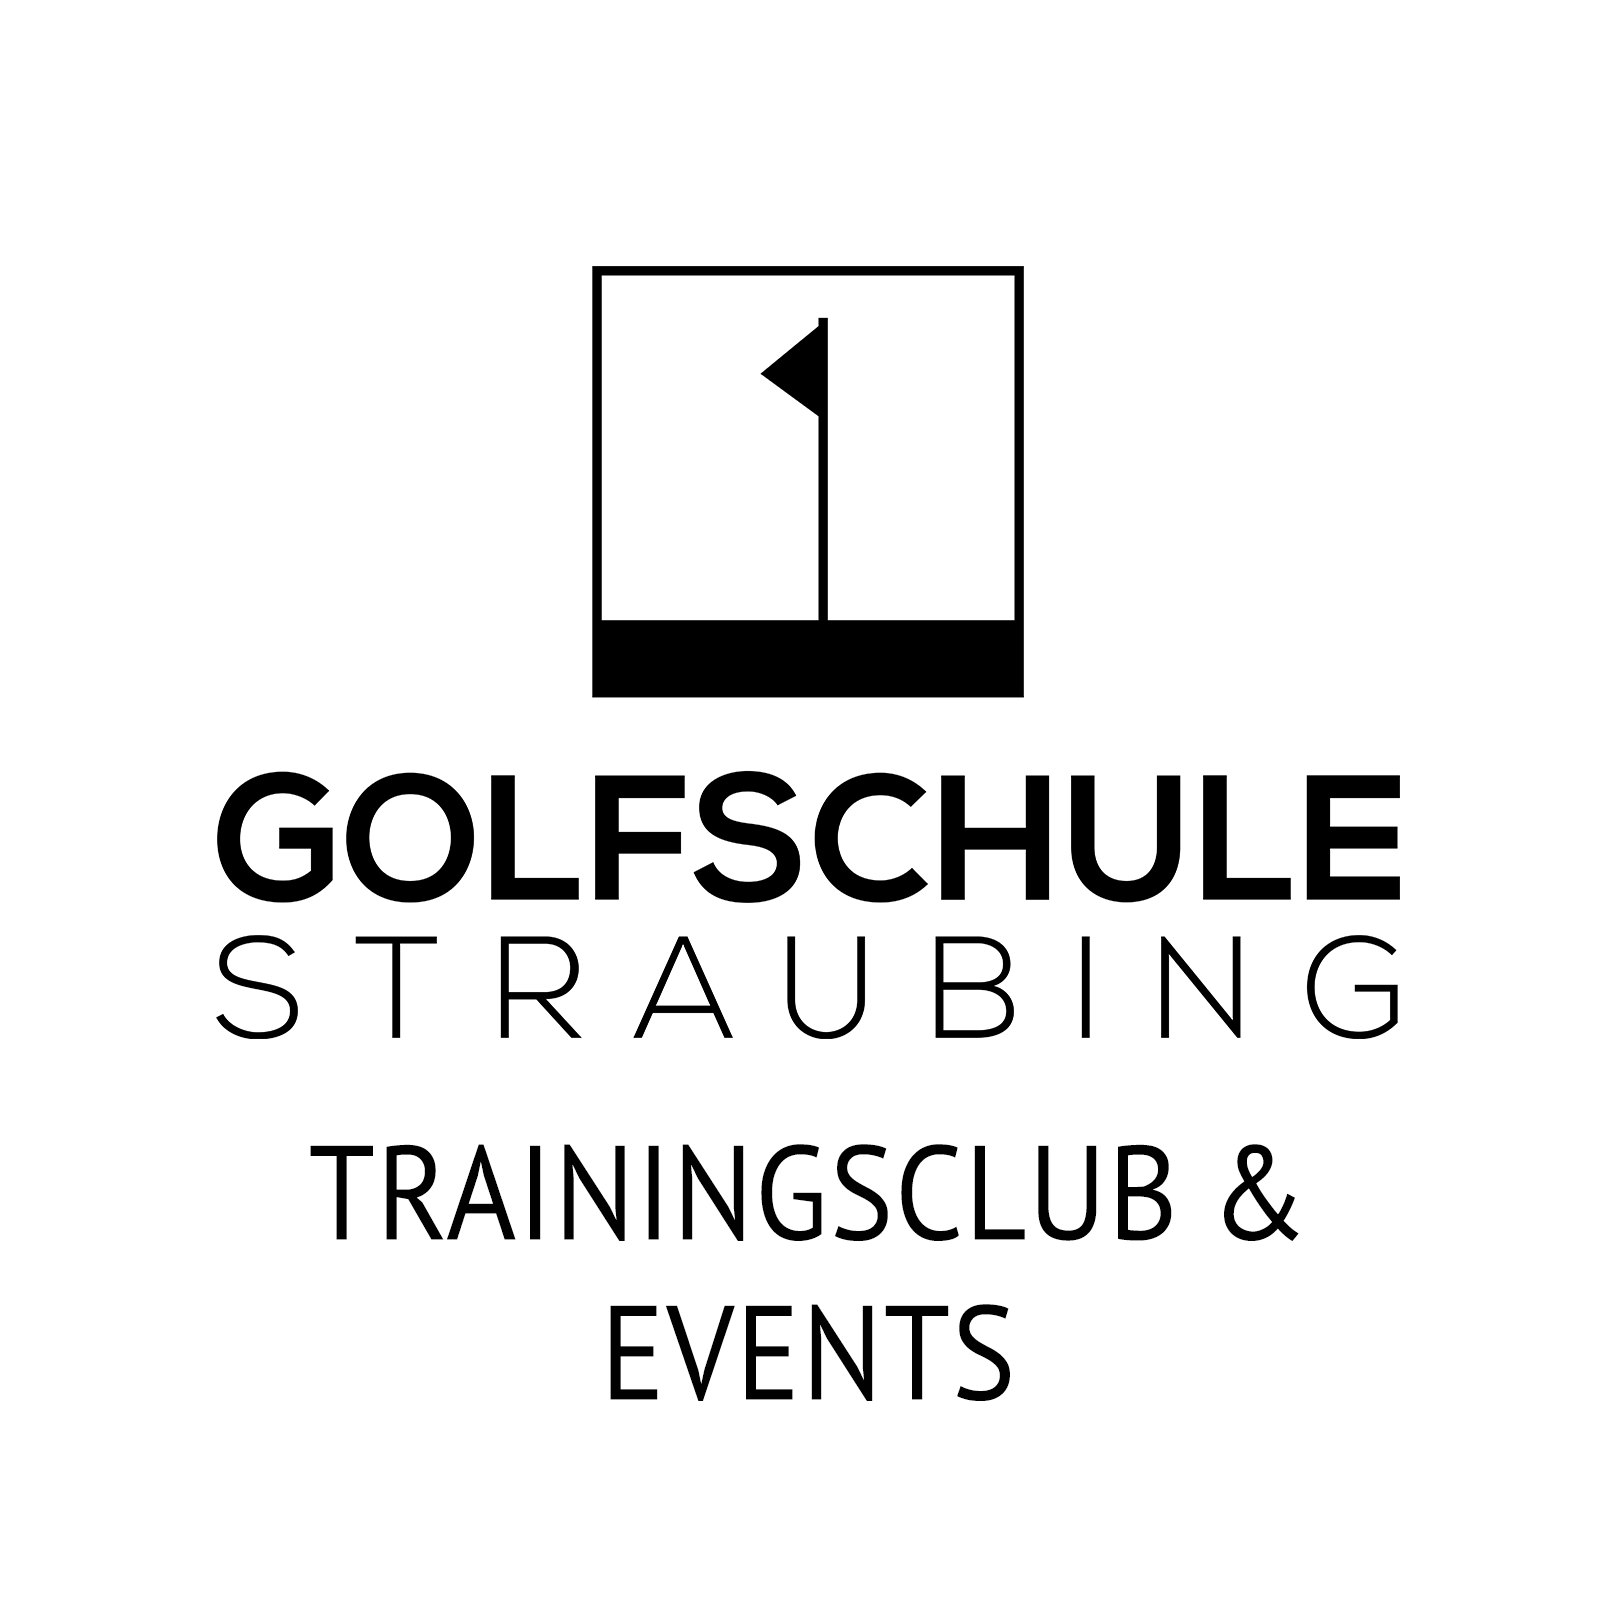 Trainingsclub